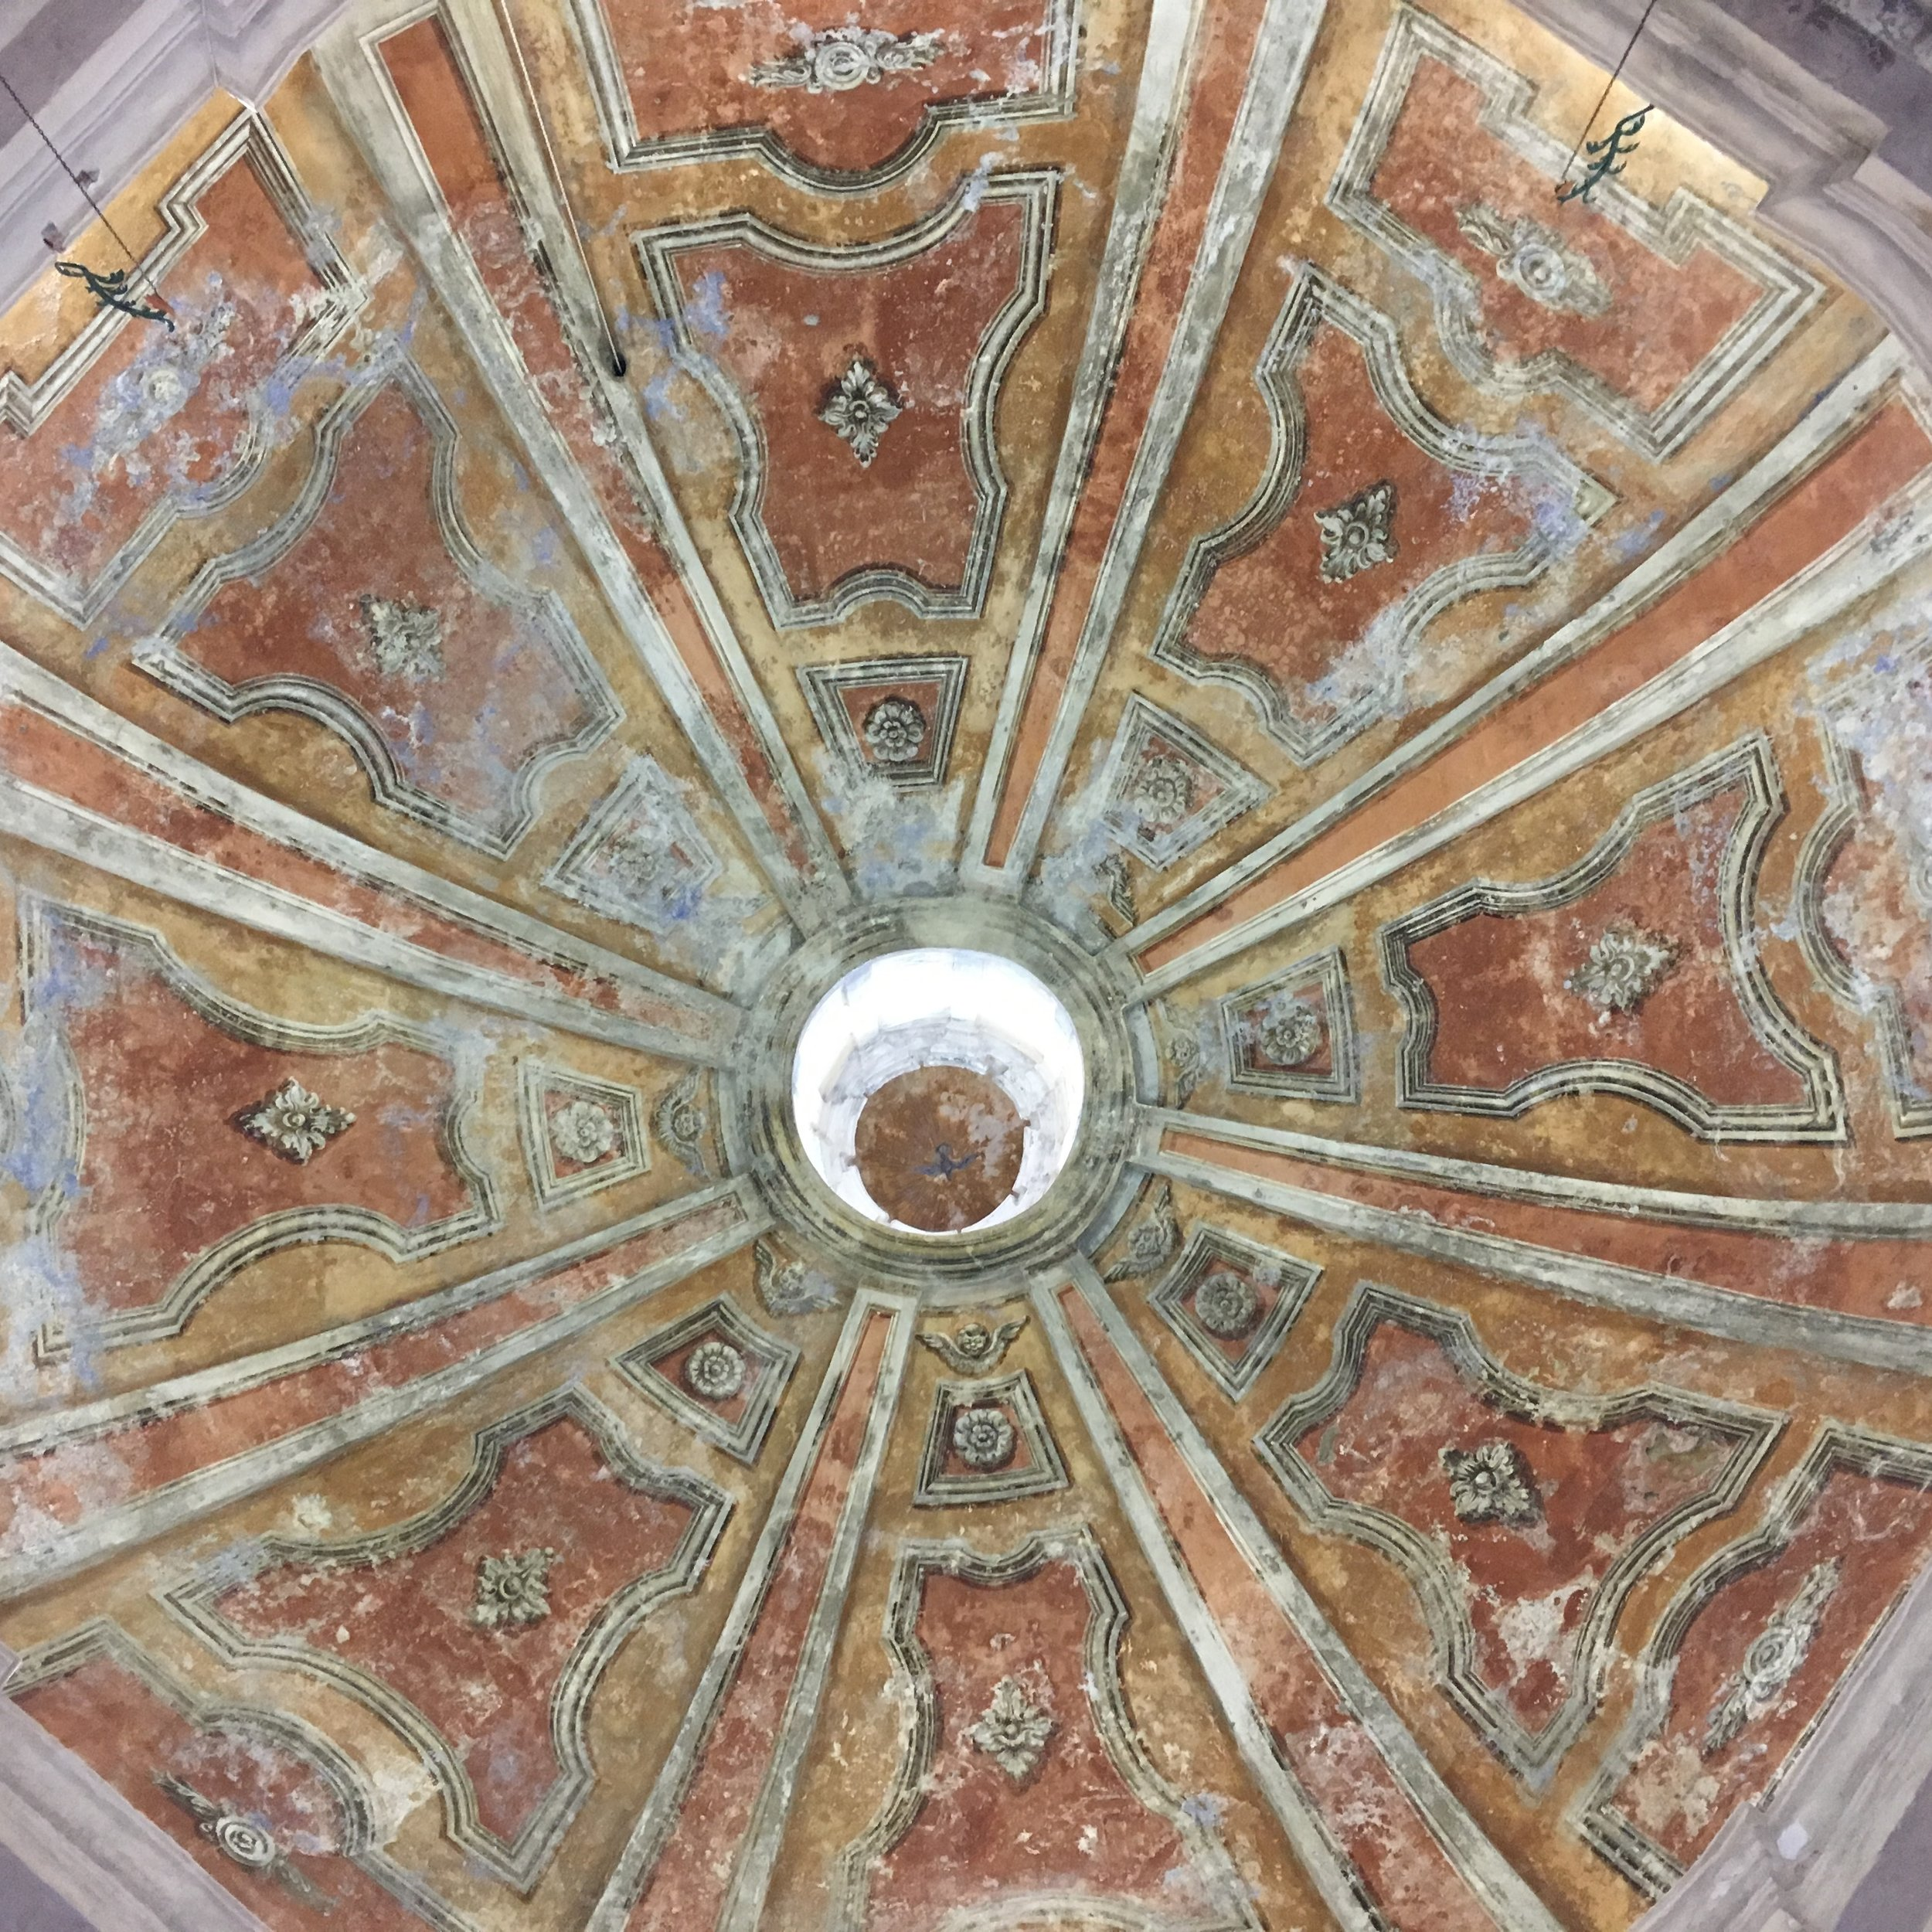 Piemonte Wine Tour - Dogliani Chapel Ceiling - La Dolce Vigna Wine Tours